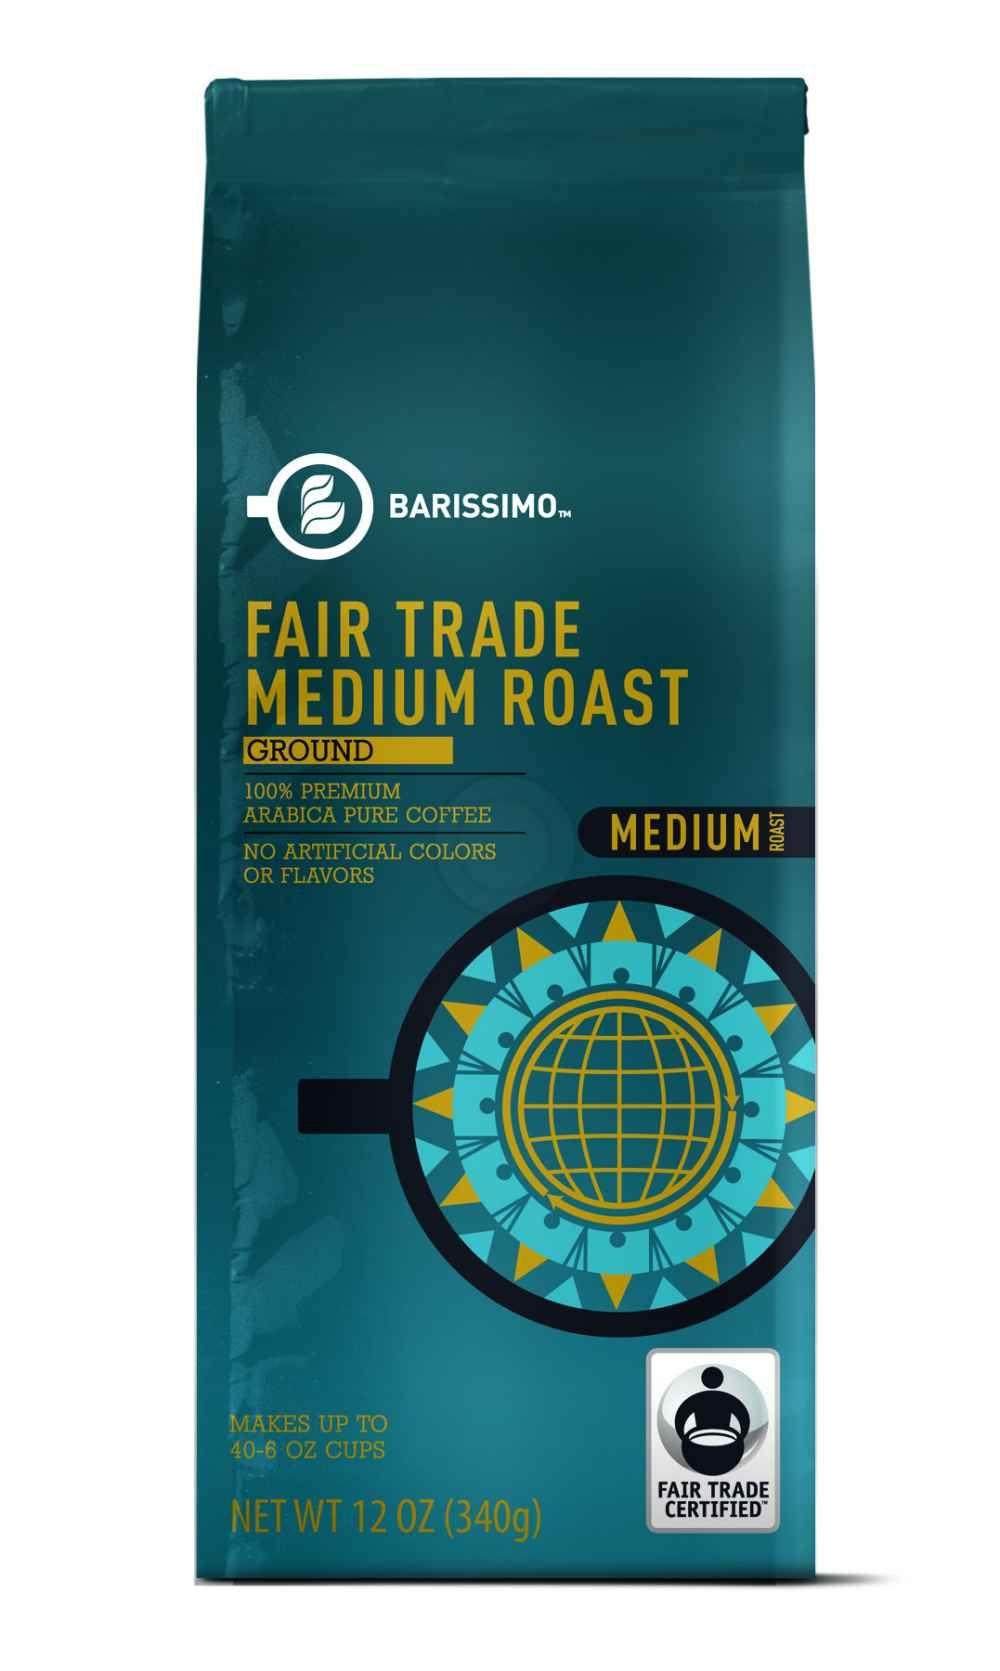 colombian instant coffee trader joe's